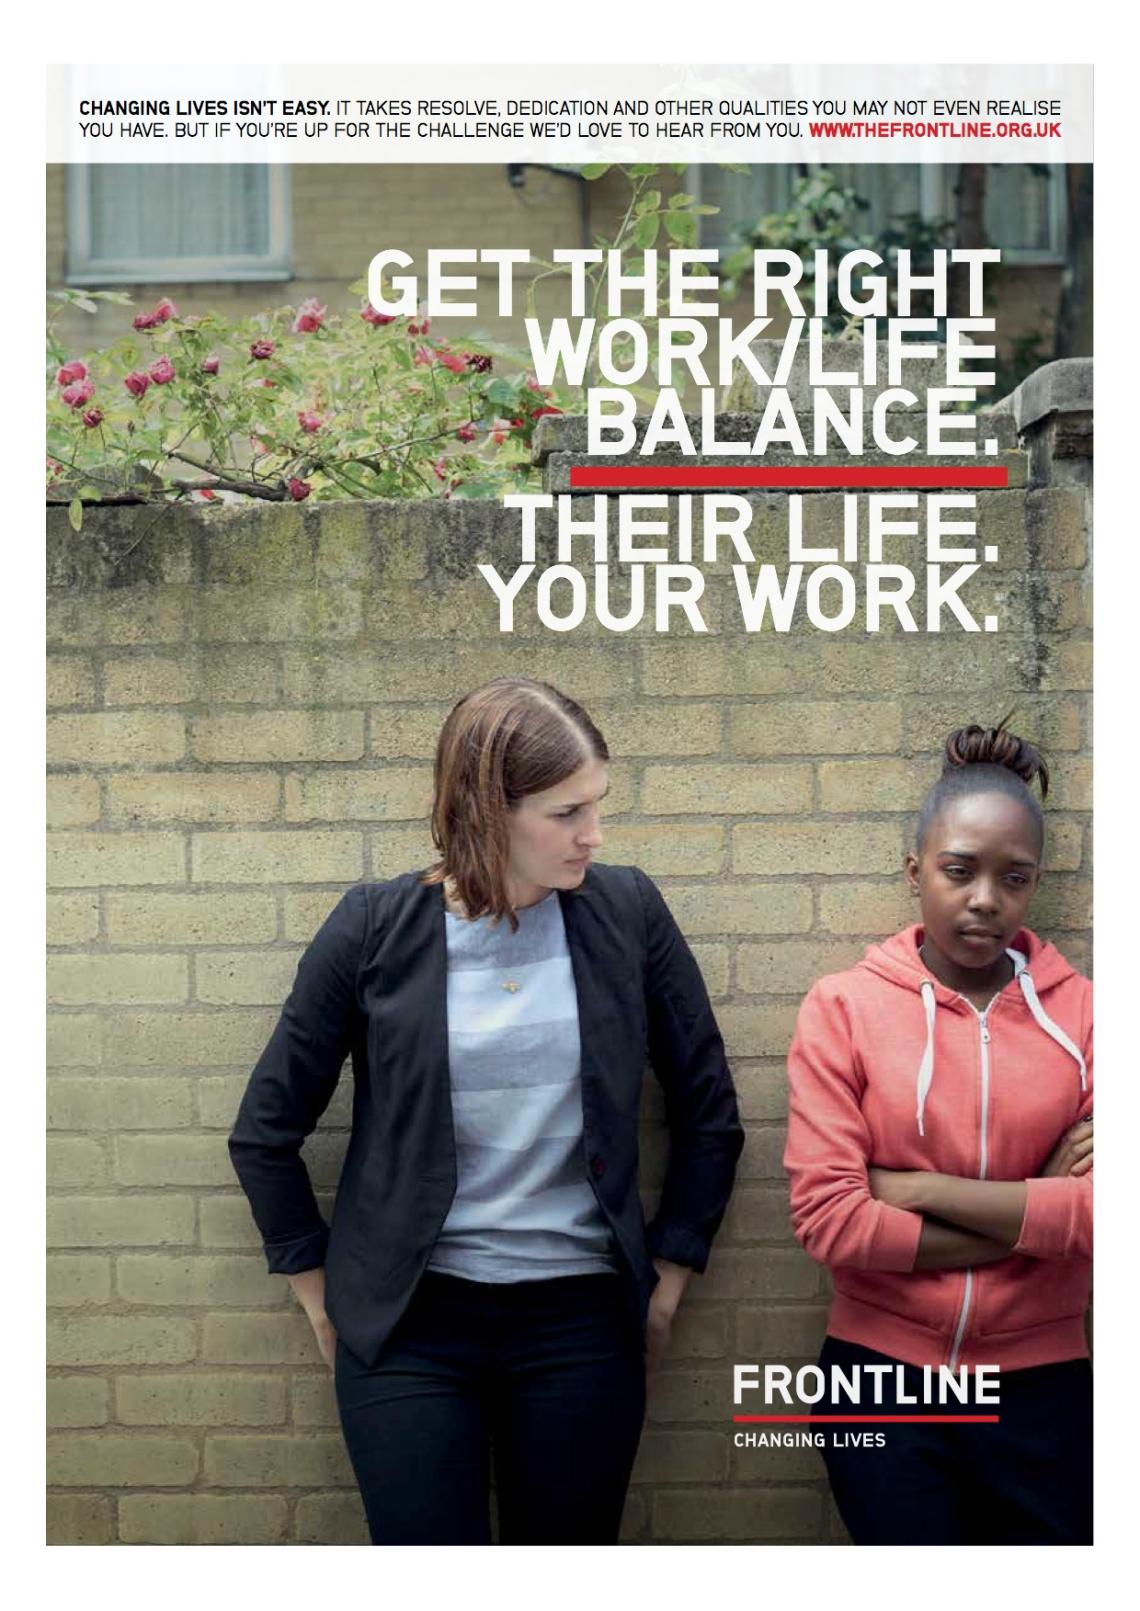 WORK:LIFE BALANCE